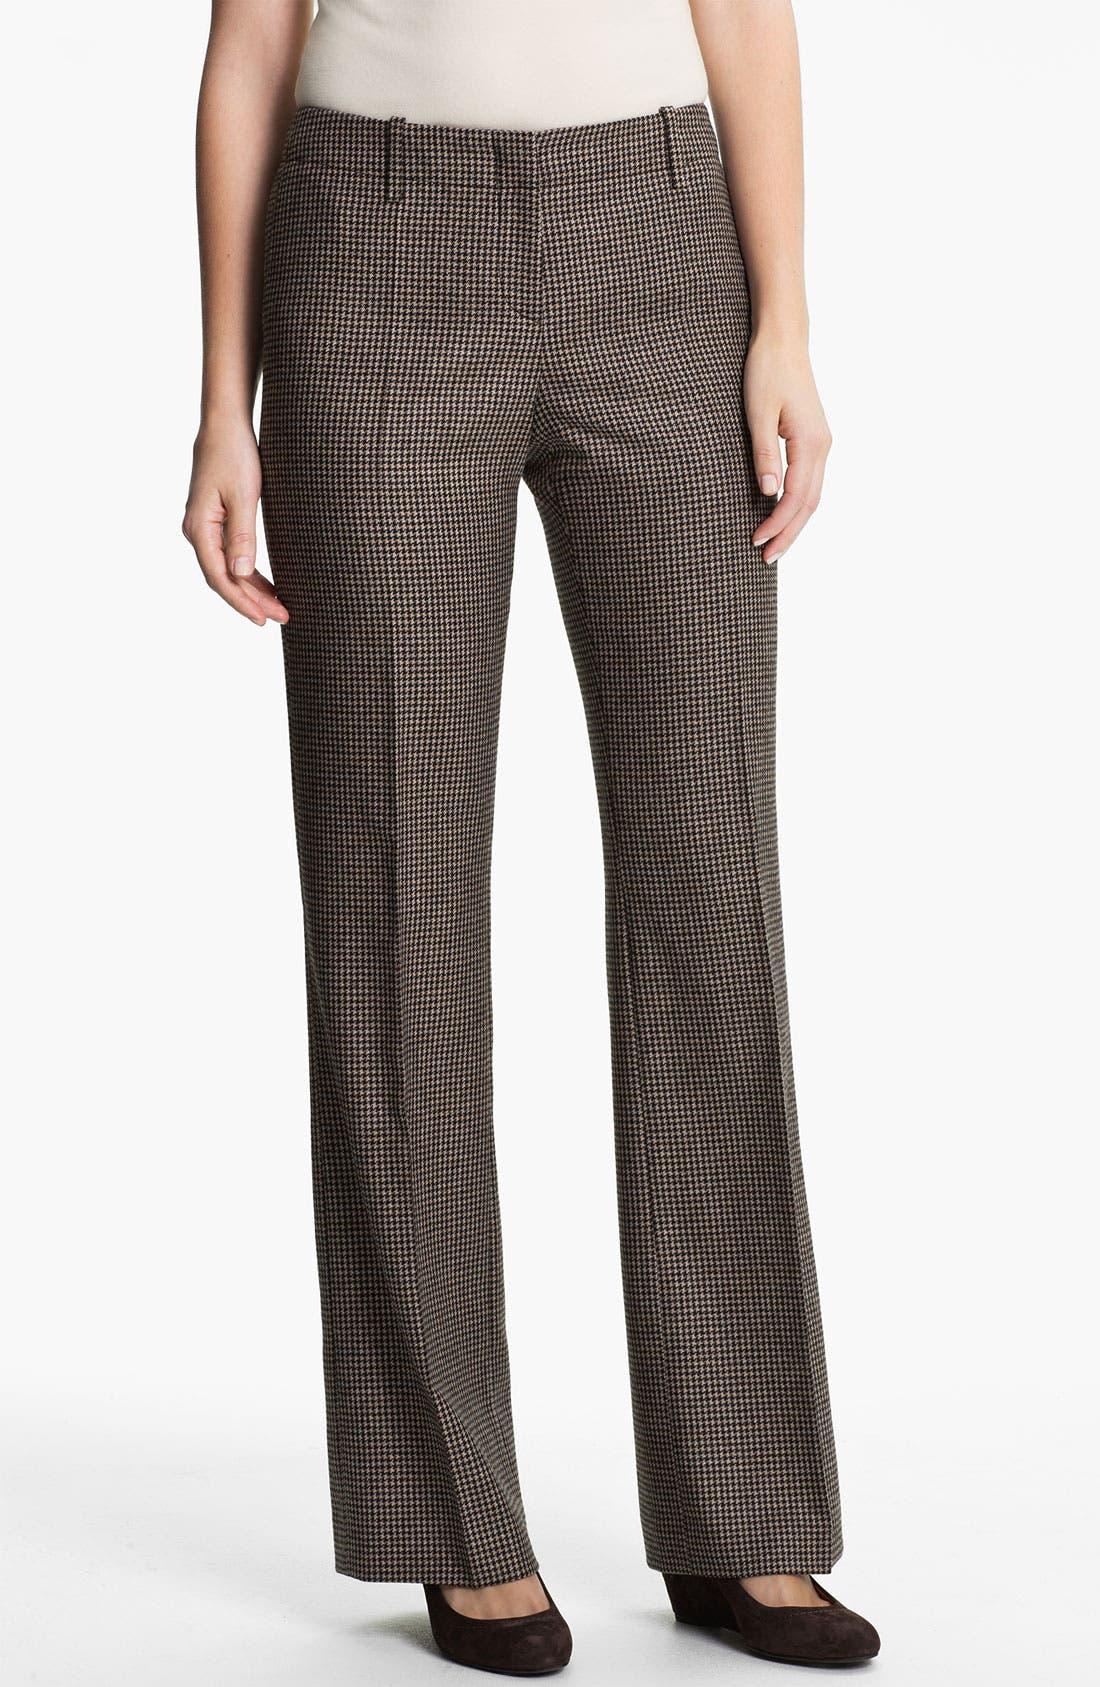 Main Image - BOSS HUGO BOSS 'Tulia4' Check Pattern Trousers